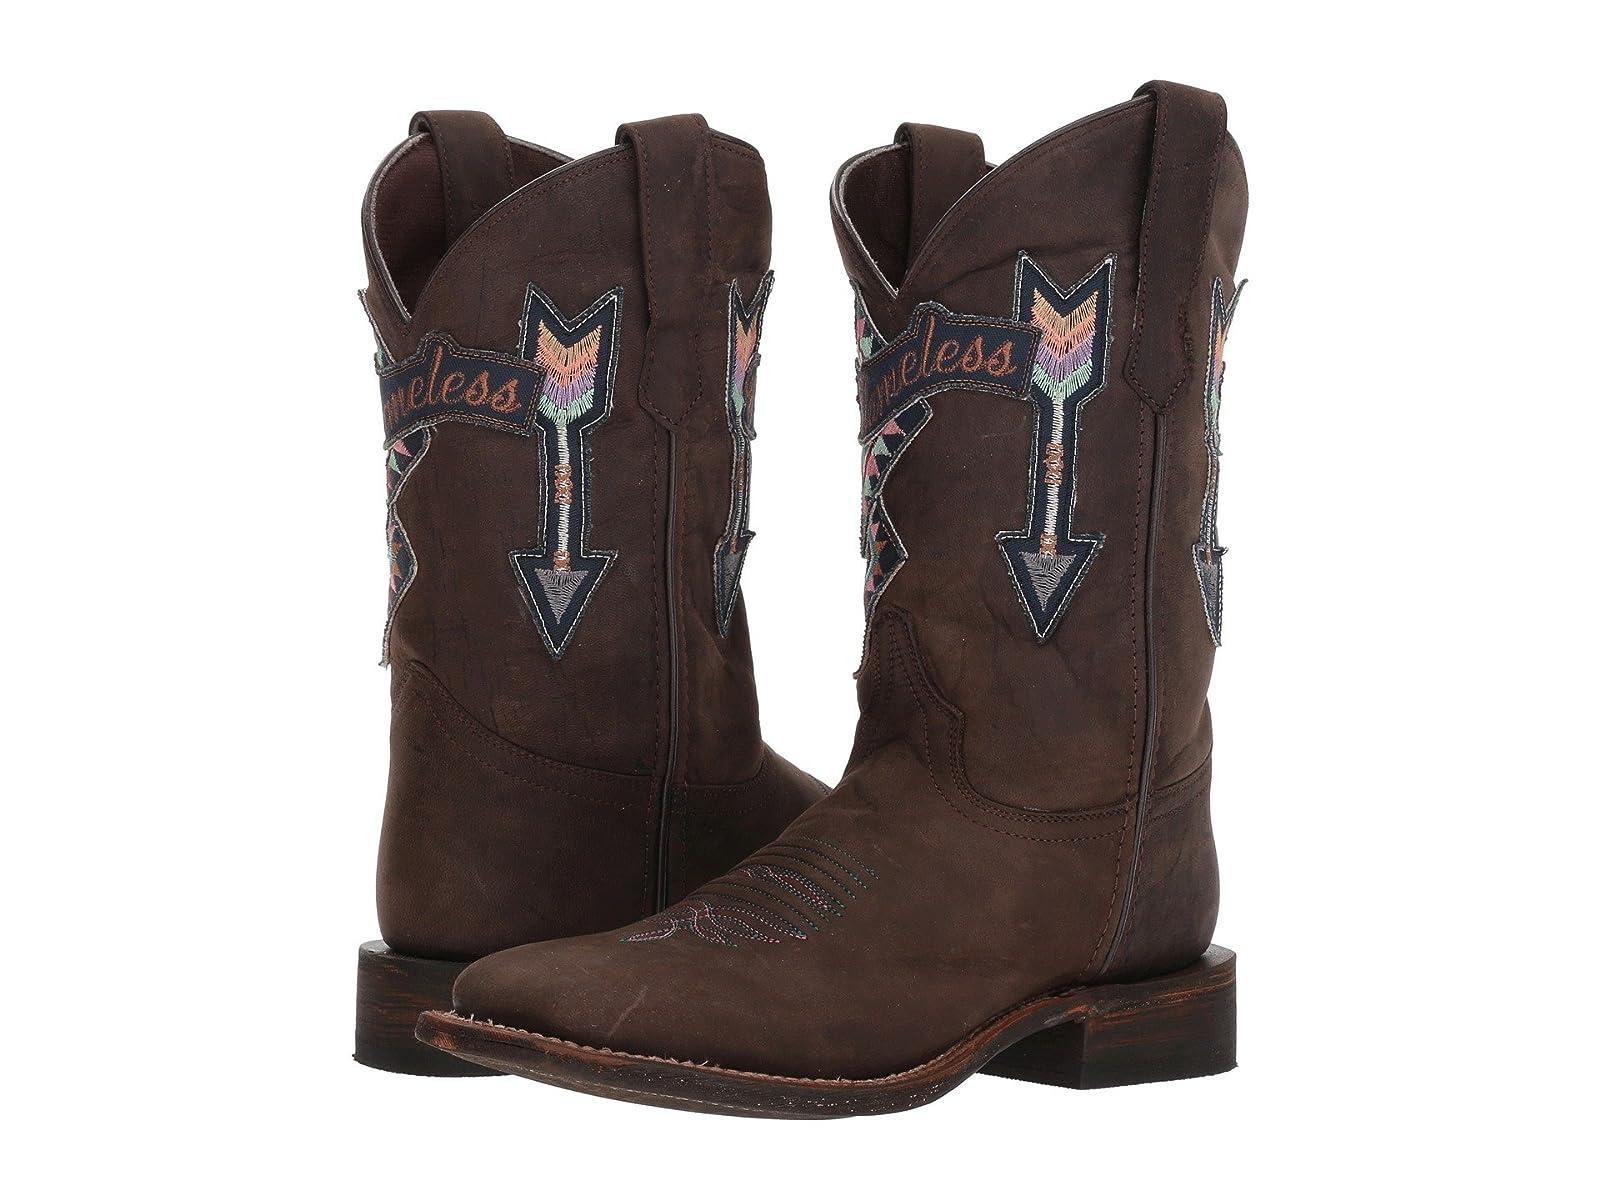 Laredo ArtyAffordable and distinctive shoes